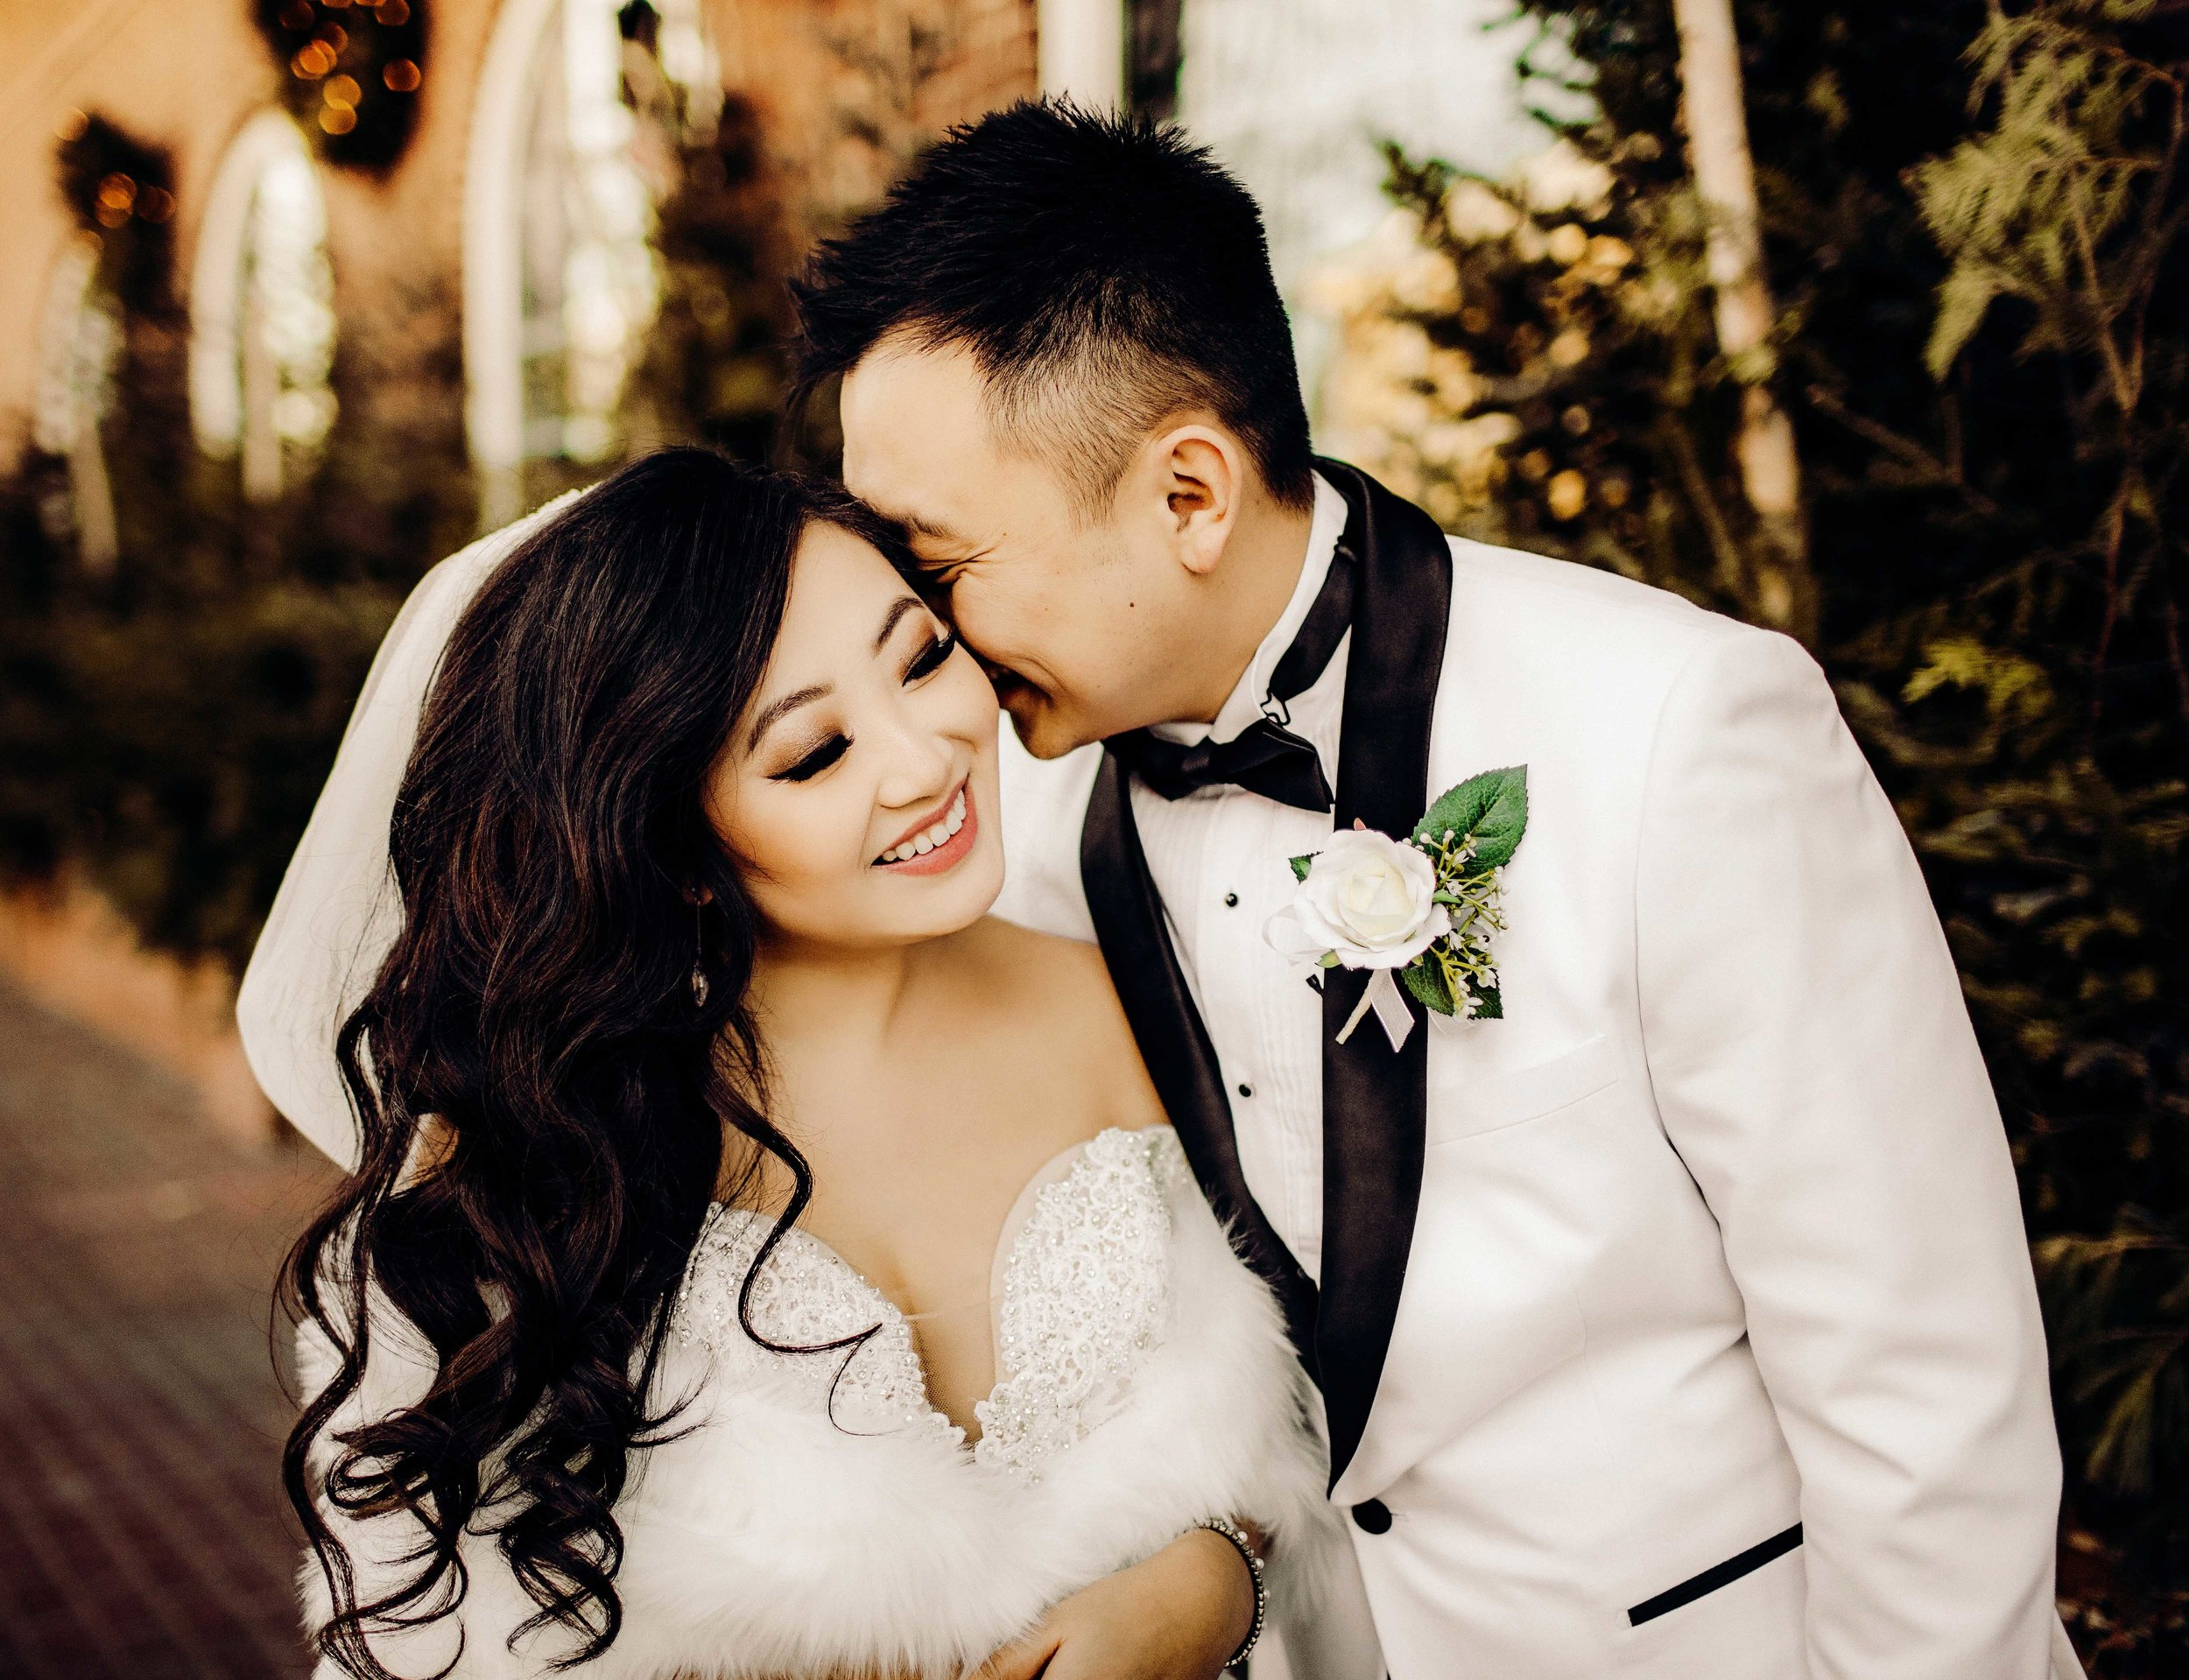 Honey + Yao, Part II, The Bride and Groom-56.jpg